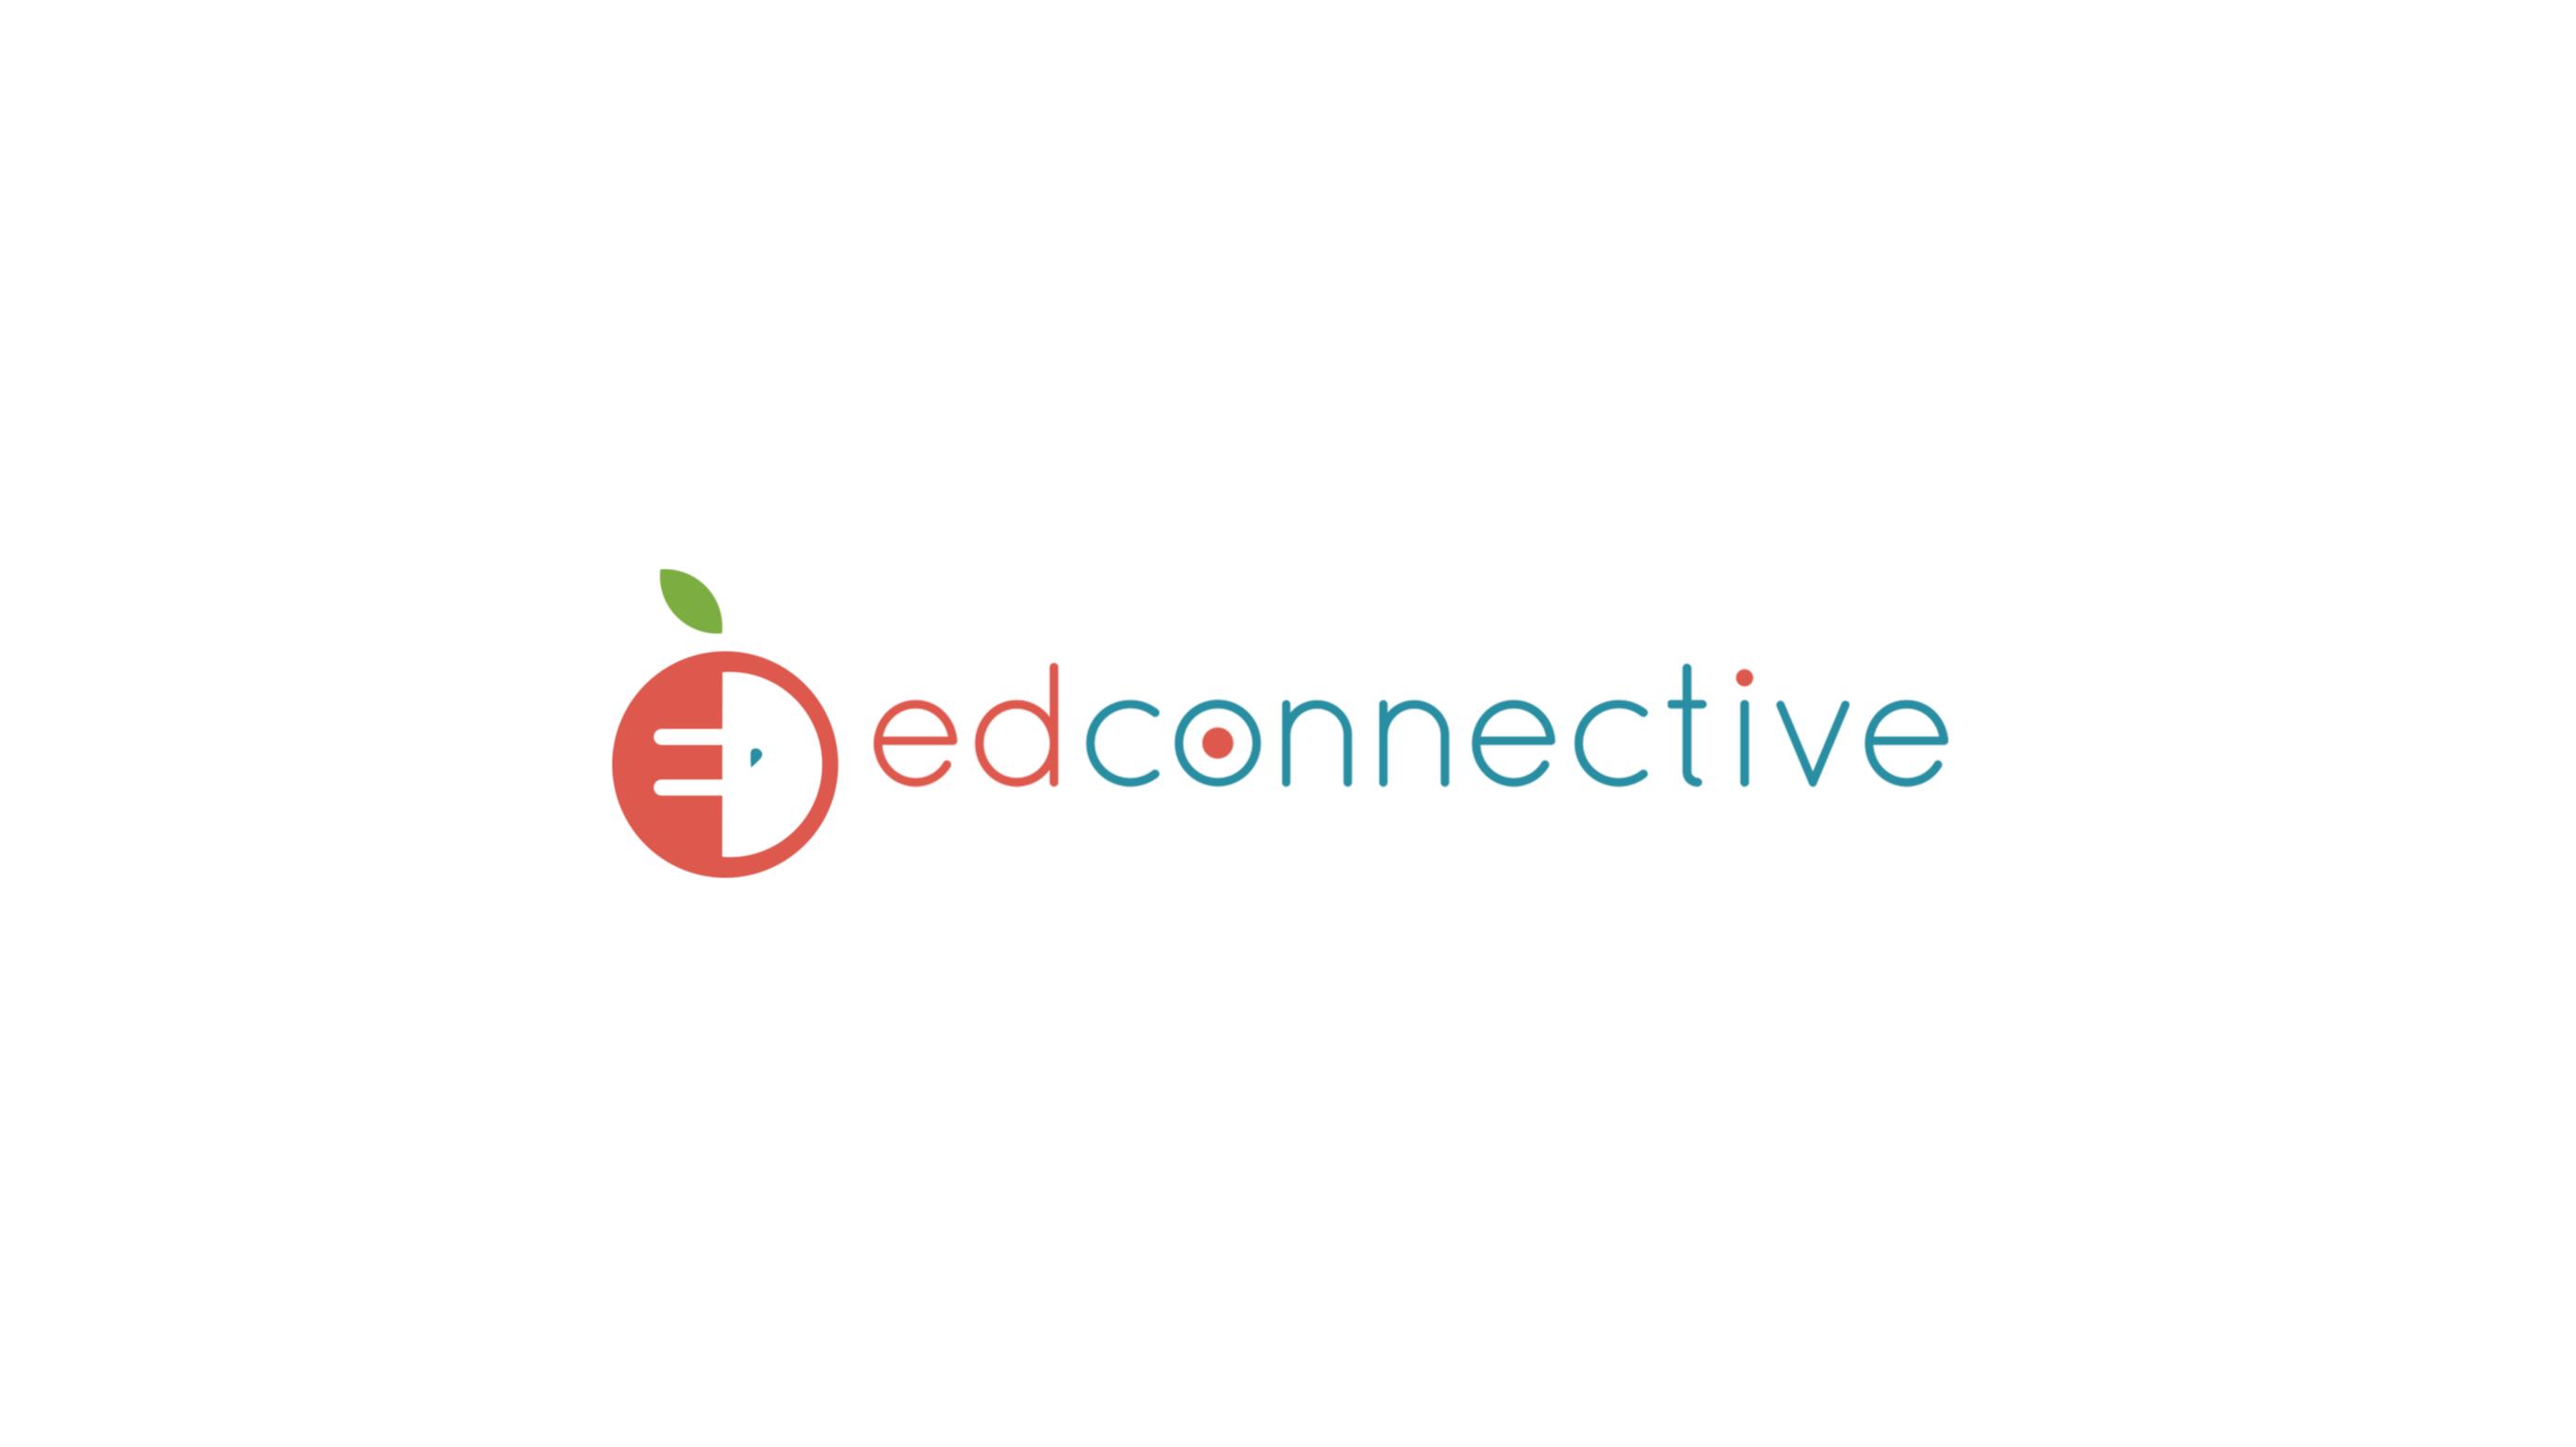 EdTech startup EdConnective